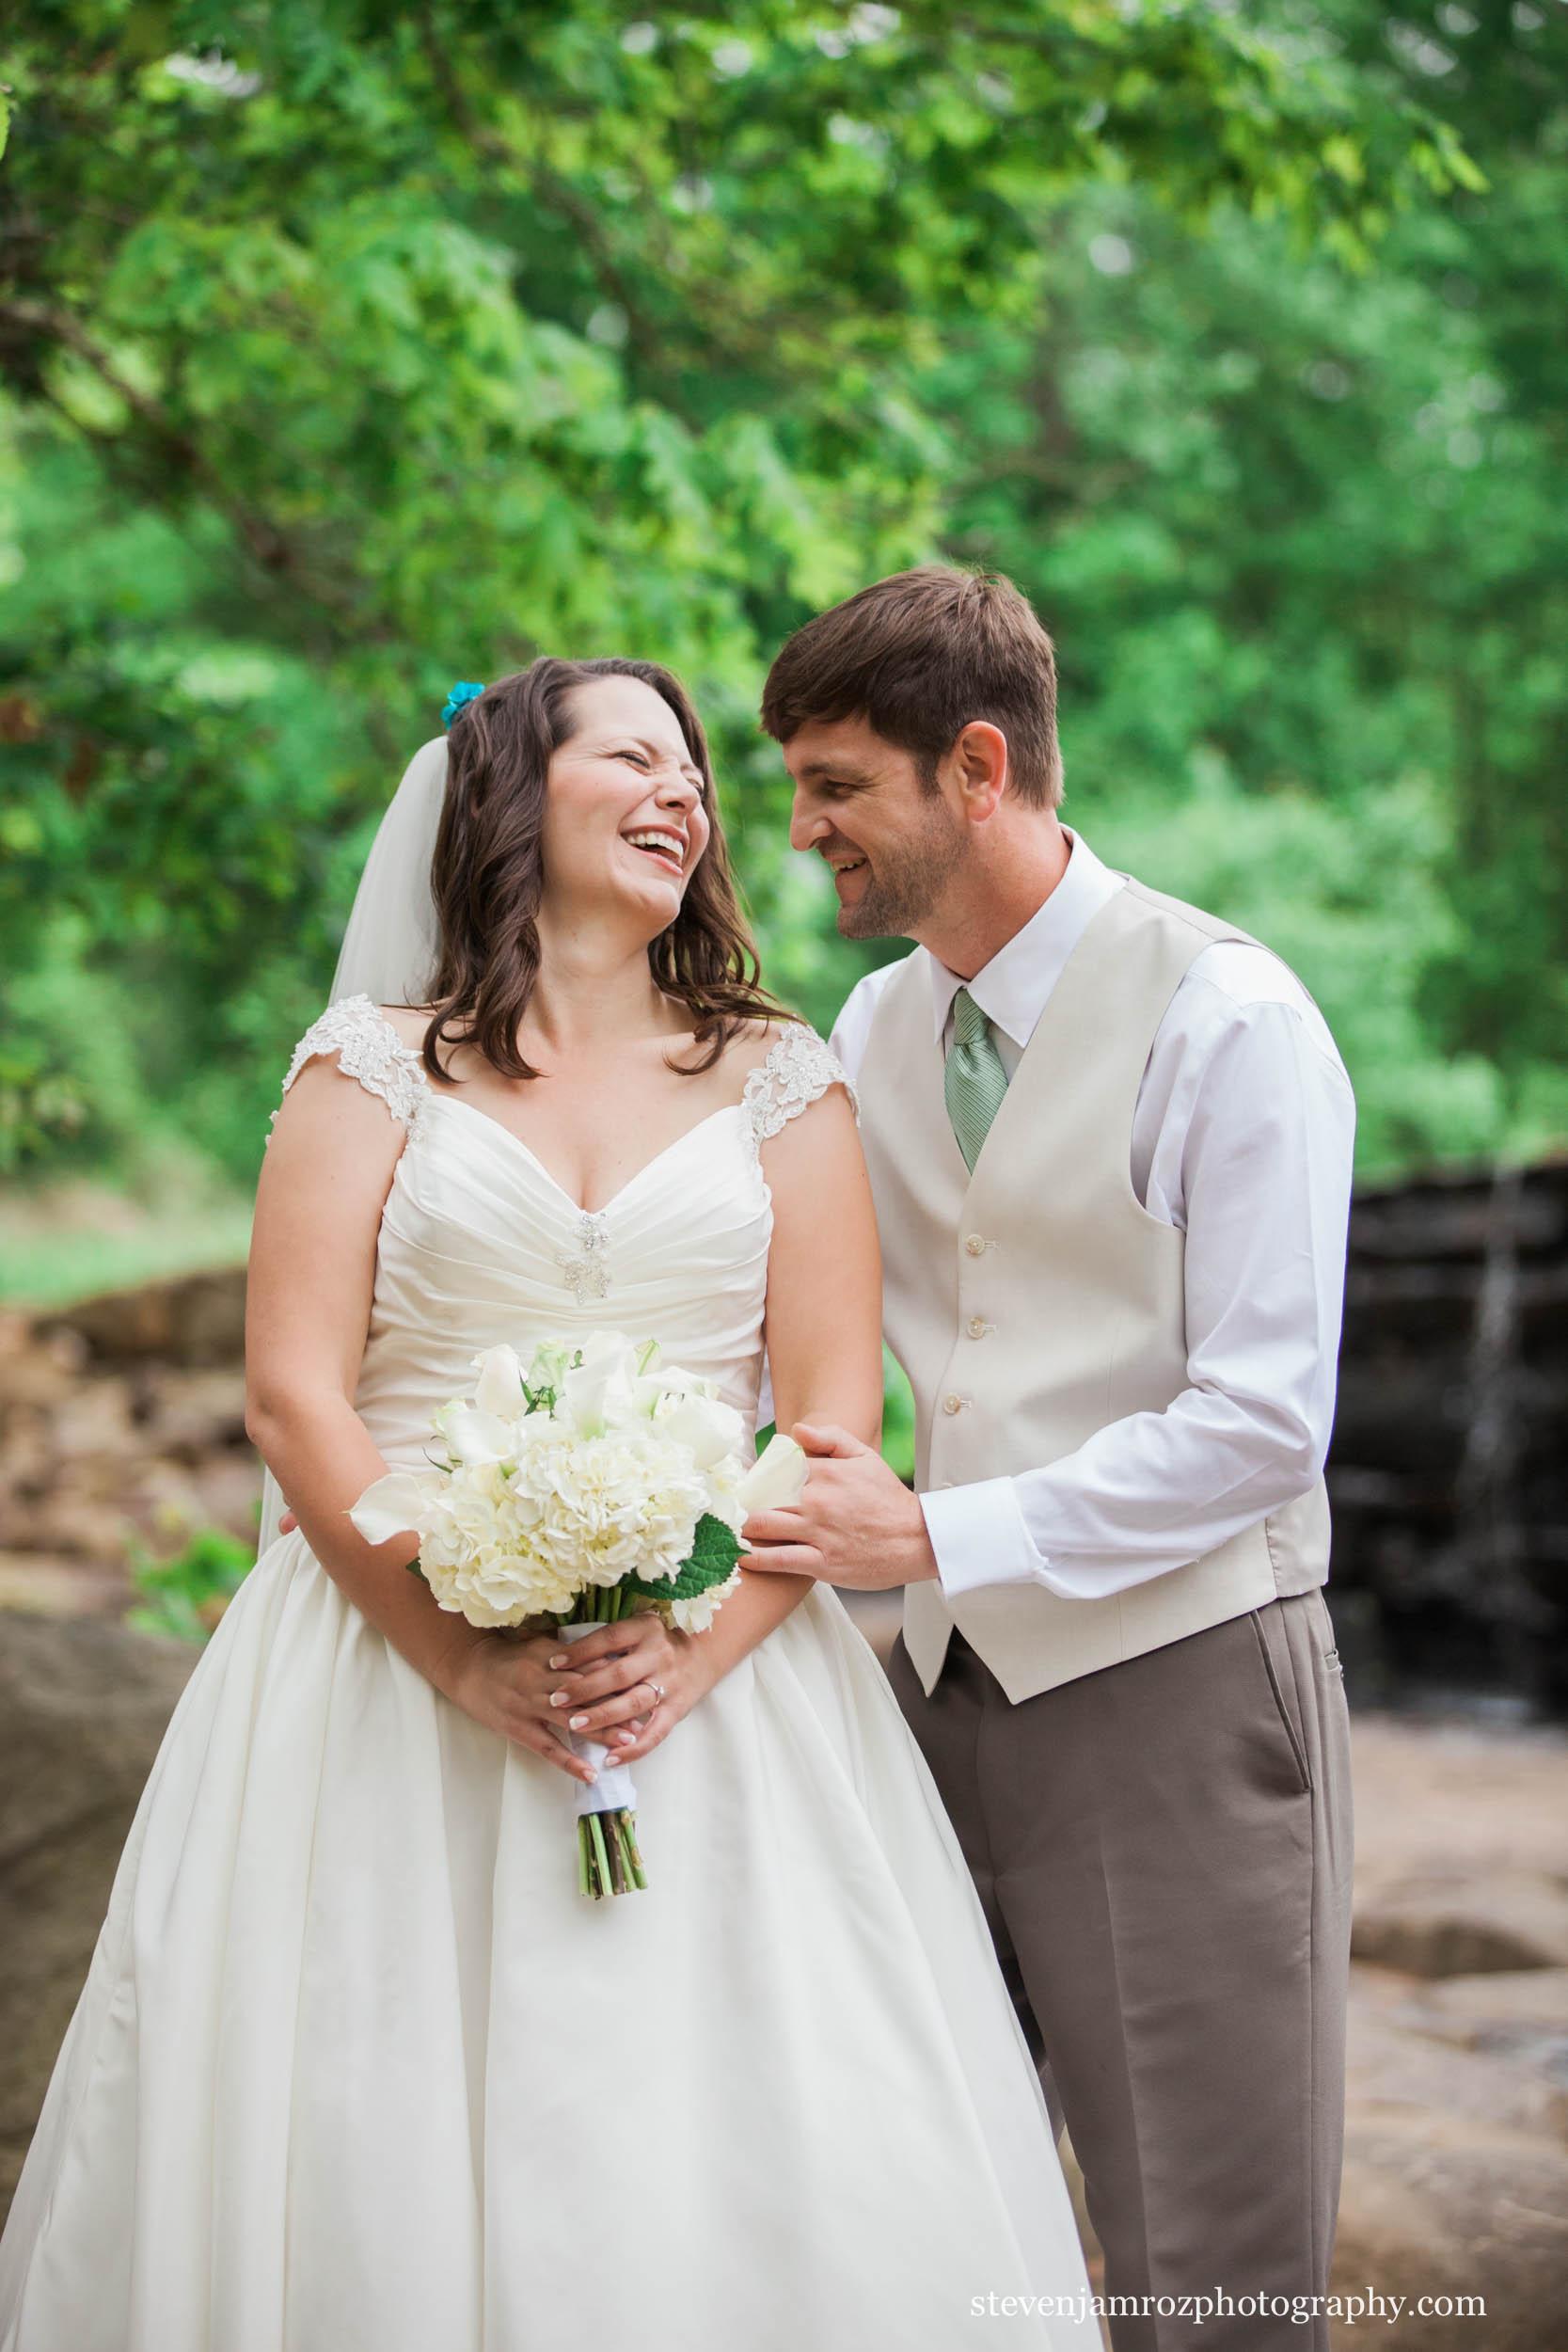 bride-groom-yates-mill-pond-session-photography-steven-jamroz-0731.jpg